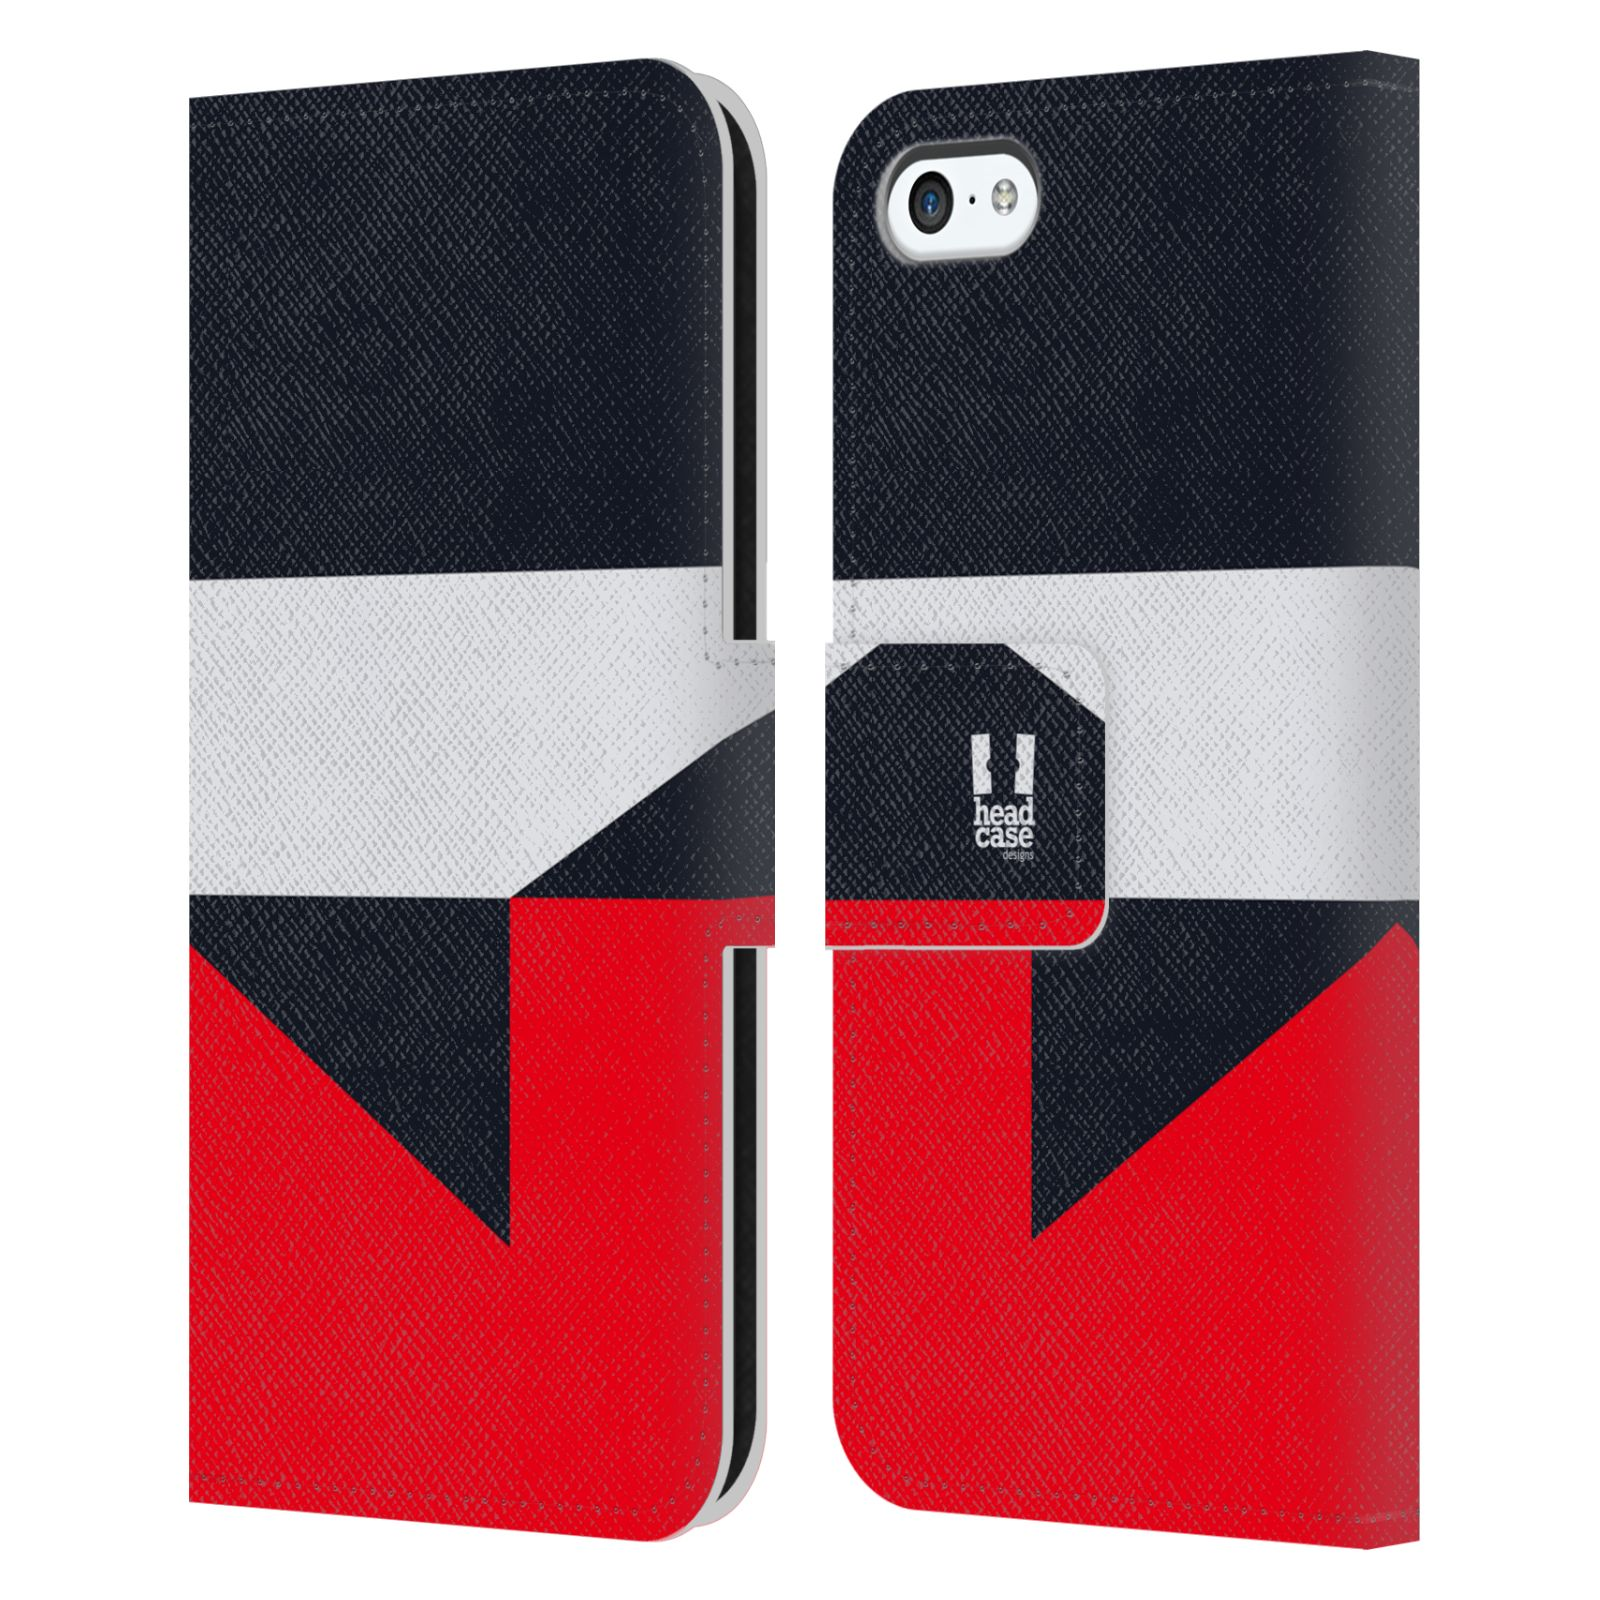 HEAD CASE Flipové pouzdro pro mobil Apple Iphone 5C barevné tvary černá a červená gejša